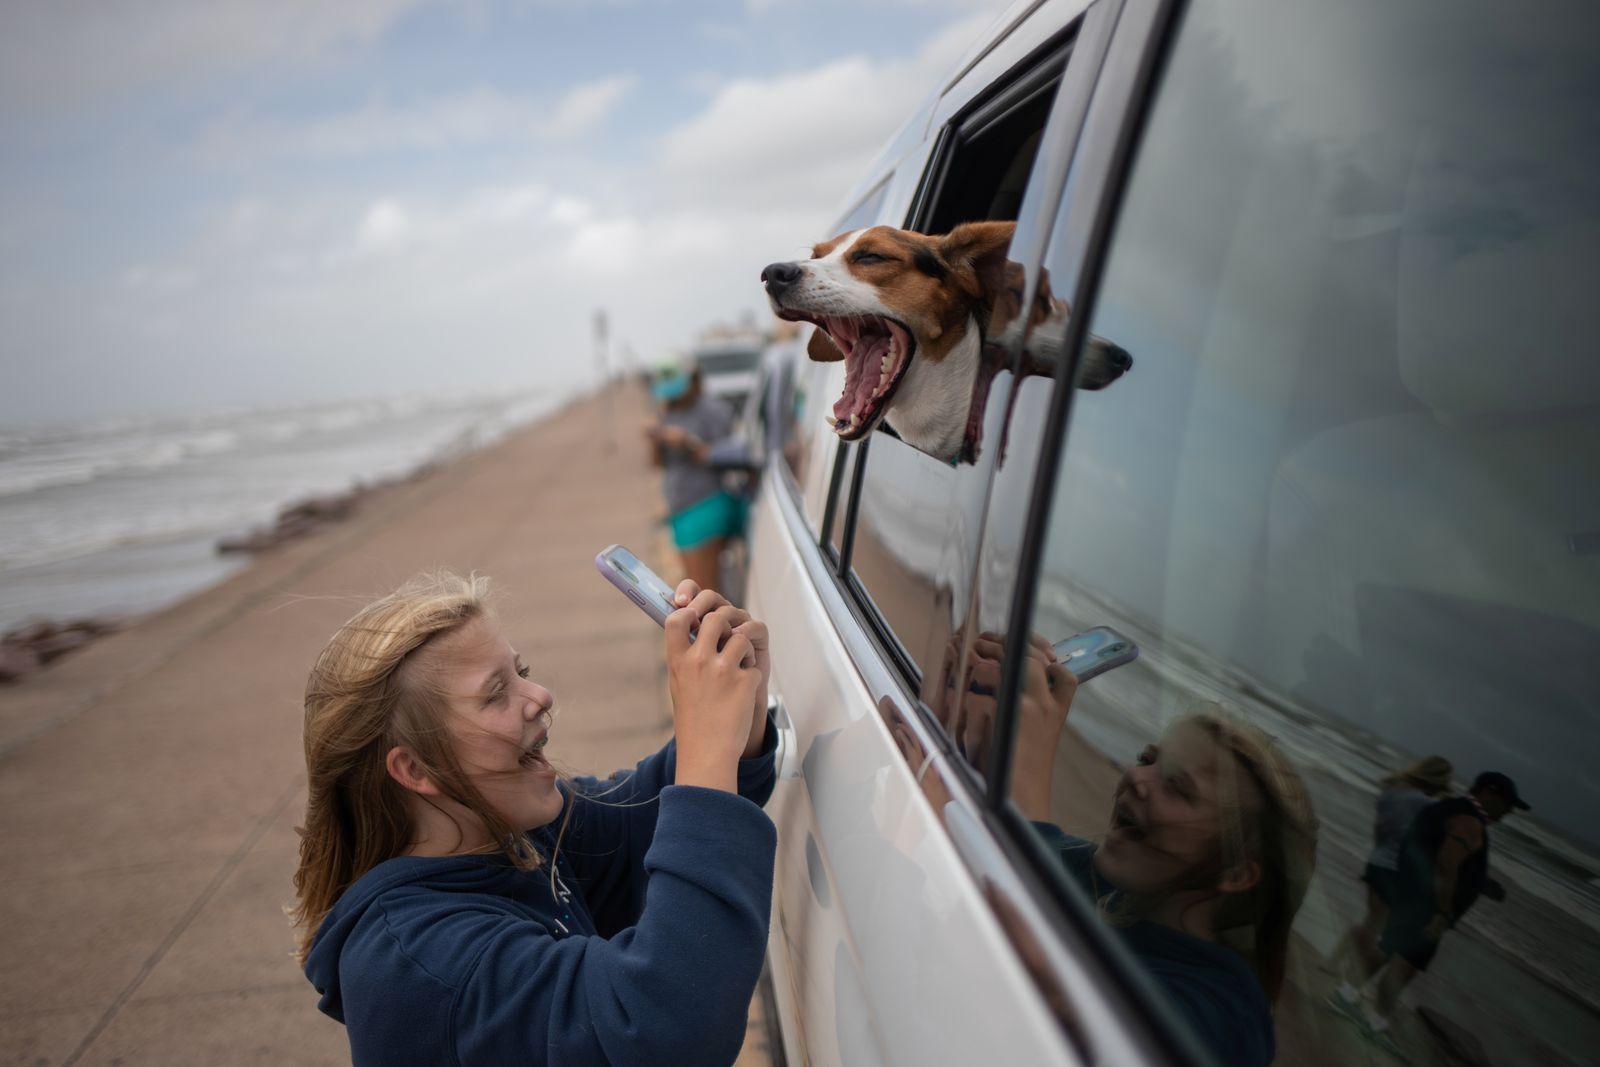 Girl photographs her dog ahead of Hurricane Laura in Galveston, Texas